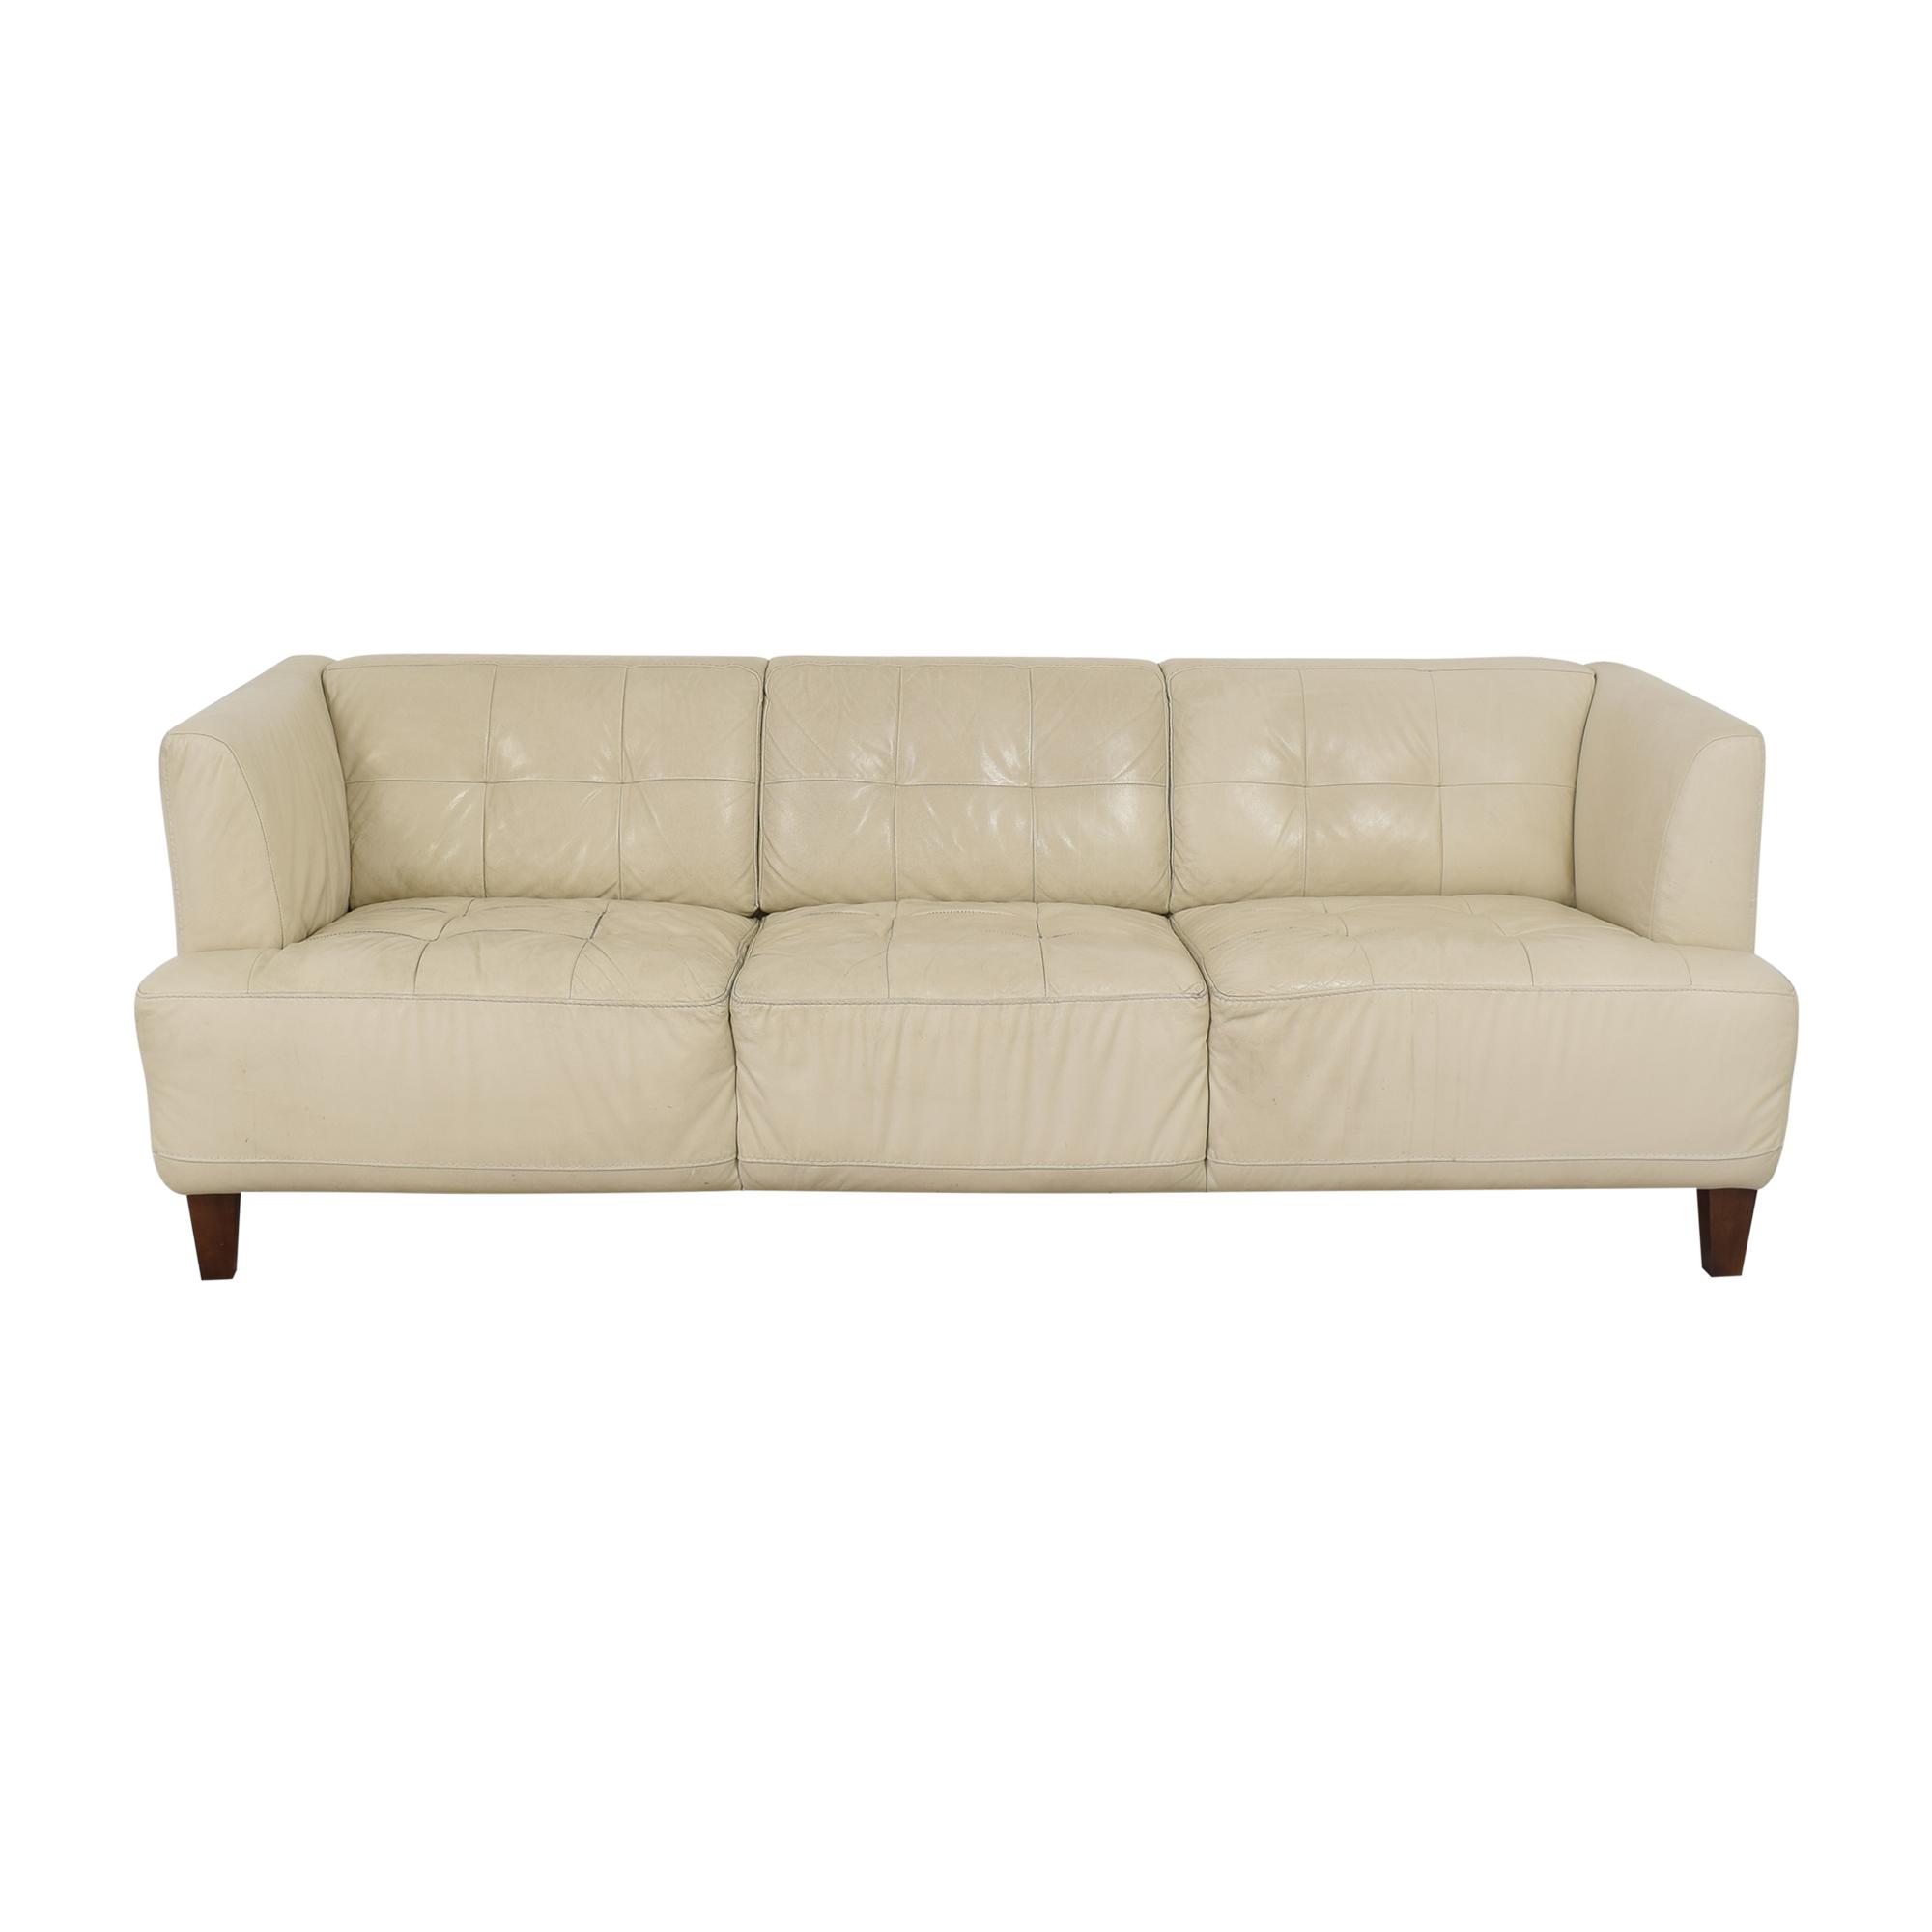 shop Macy's Macy's Tufted Three Cushion Sofa online